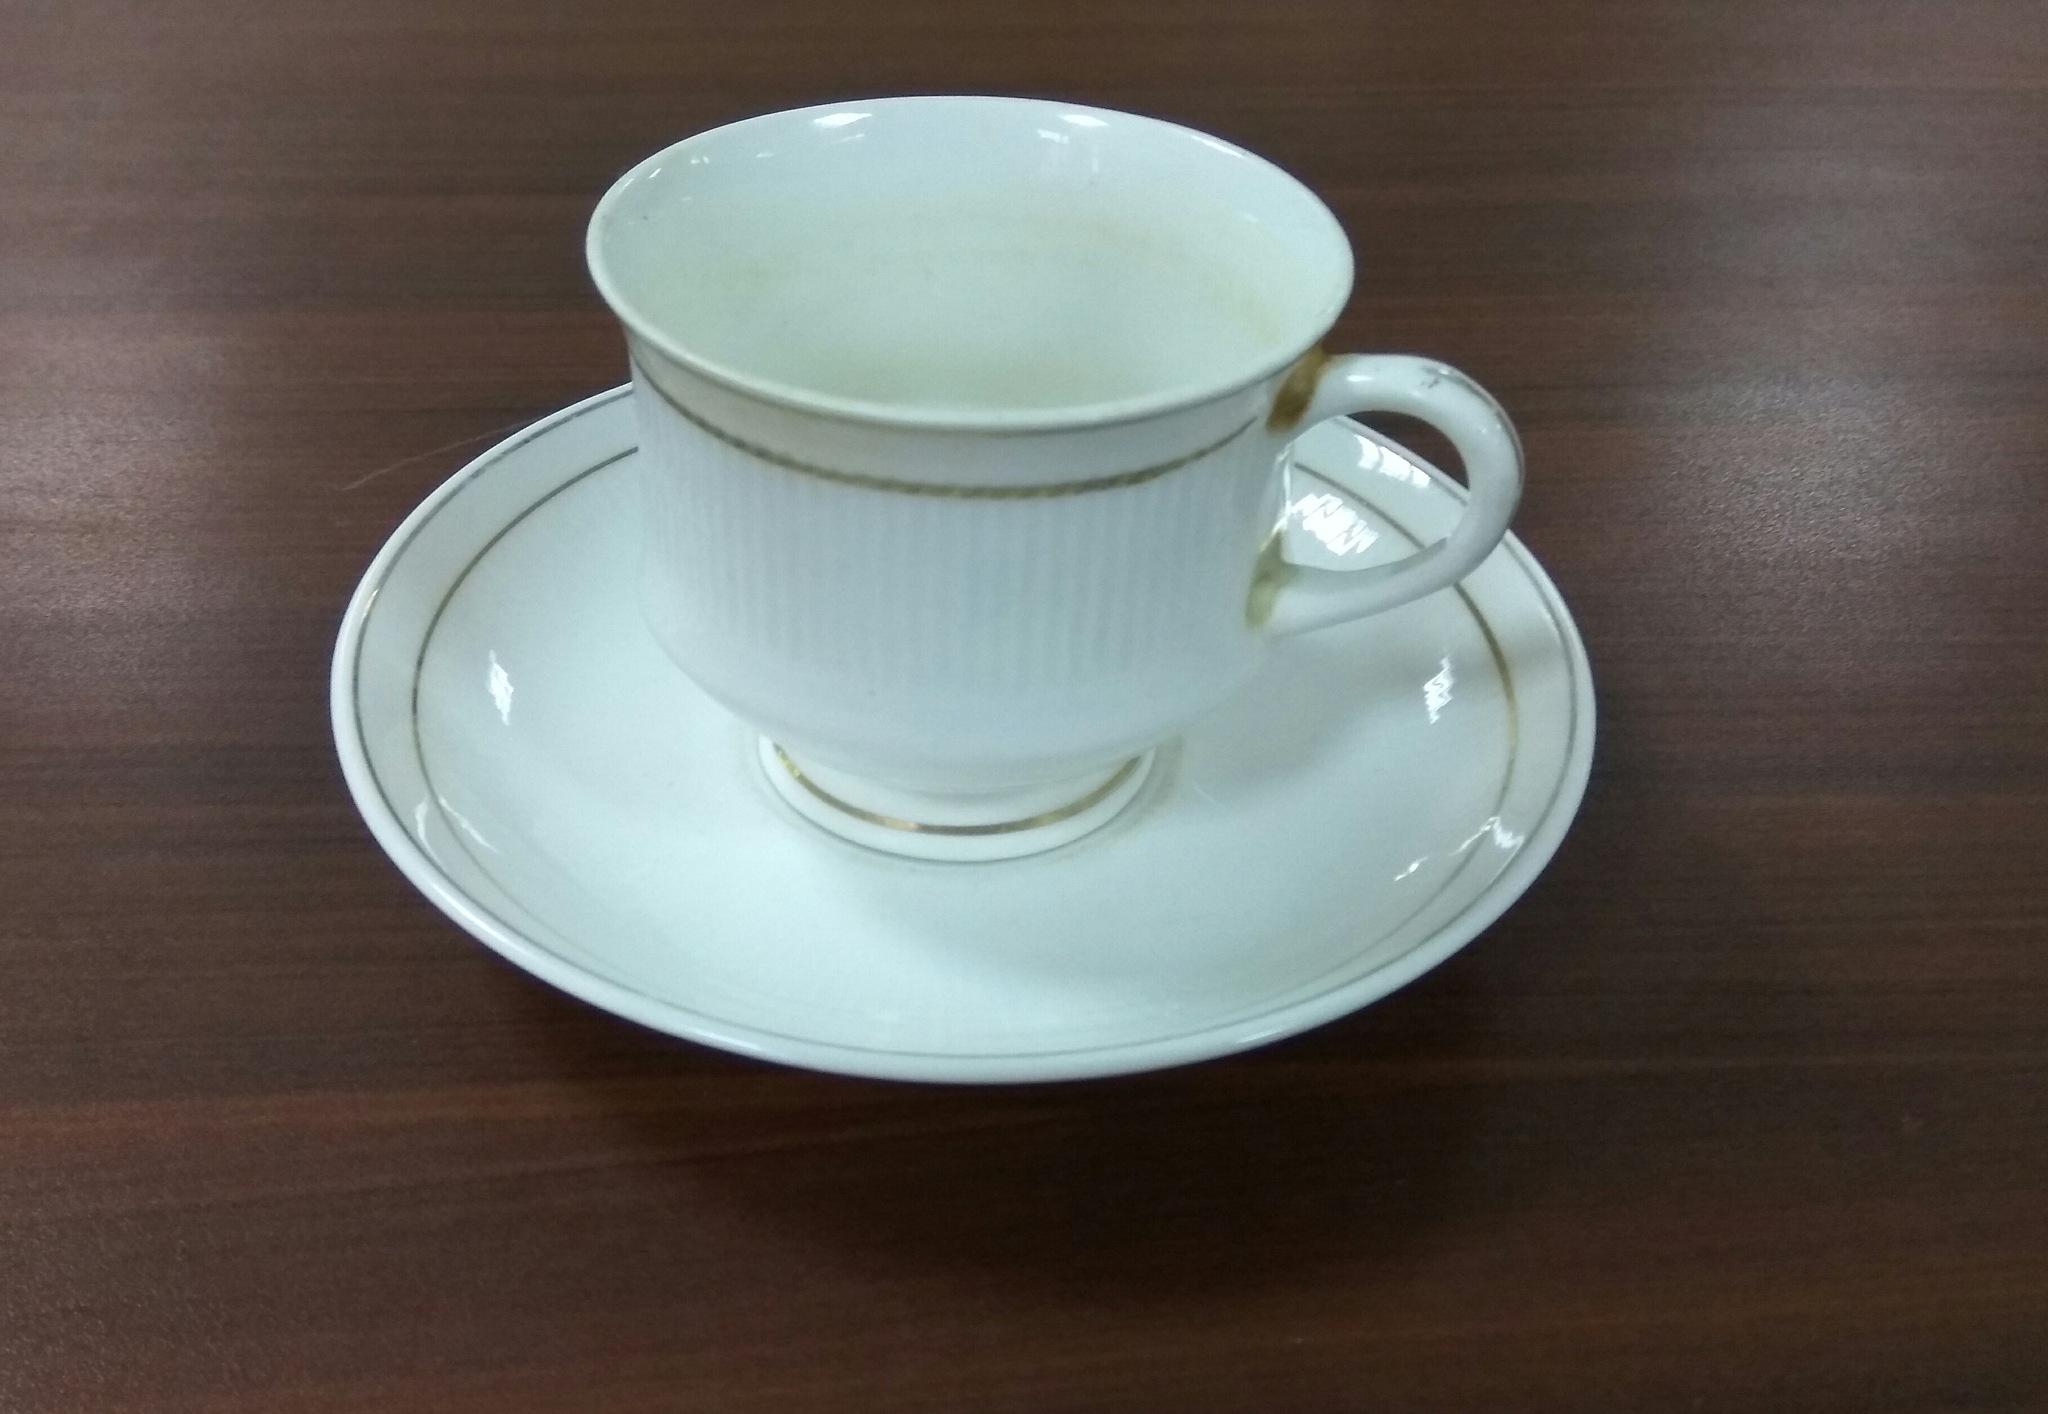 Cup  by Vipin Kumar Sharma